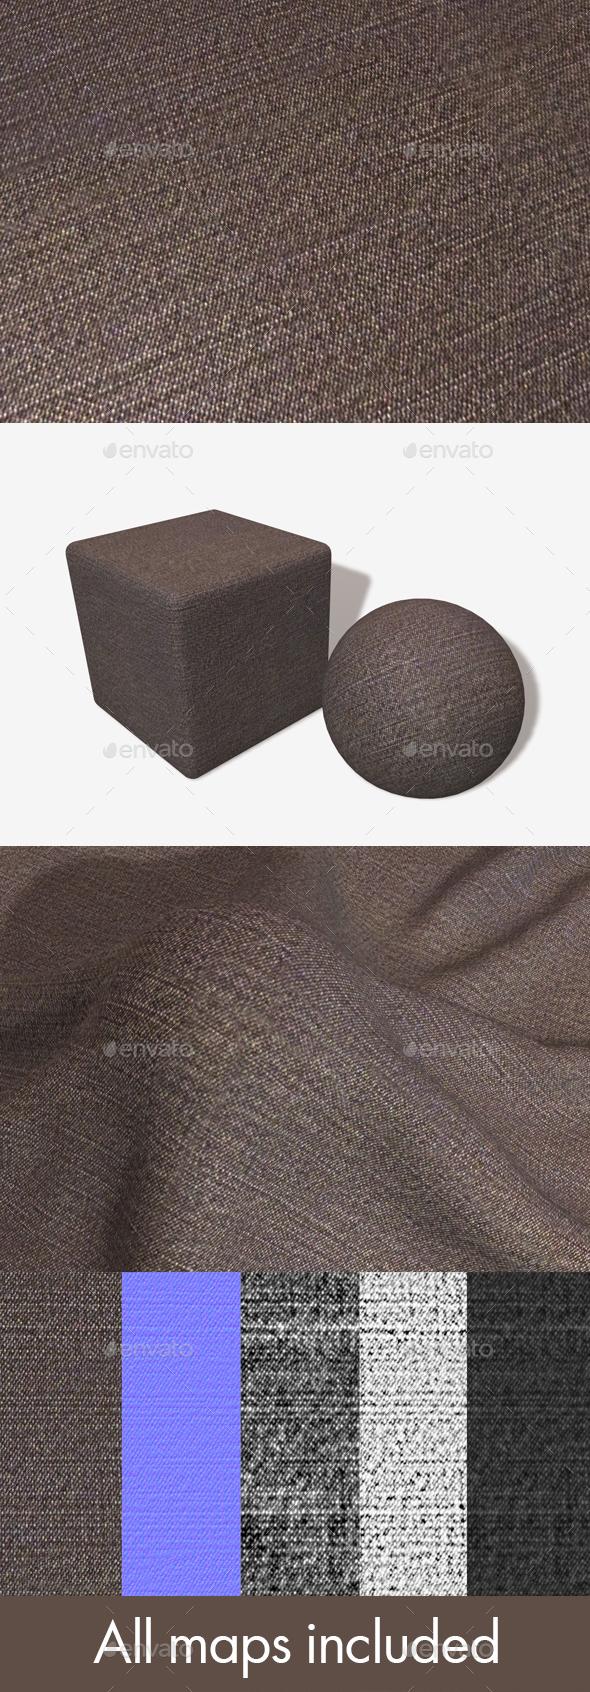 Dark Brown Denim Seamless Texture - 3DOcean Item for Sale